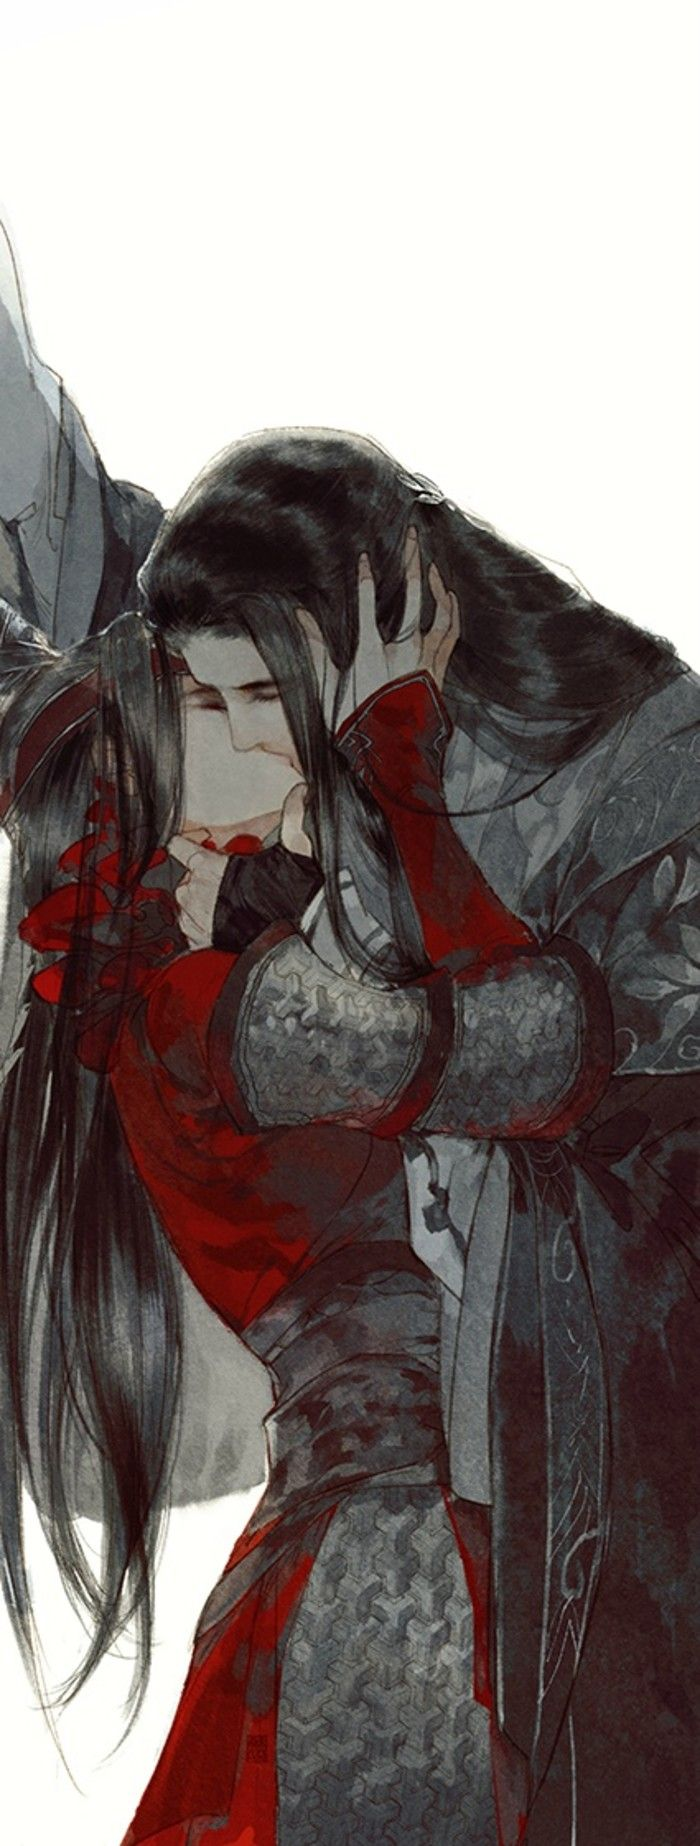 ~tender mature kiss illustration by 伊吹五月 (Y Xuy Ngũ Nguyệt) -(Ibuki Satsuki)